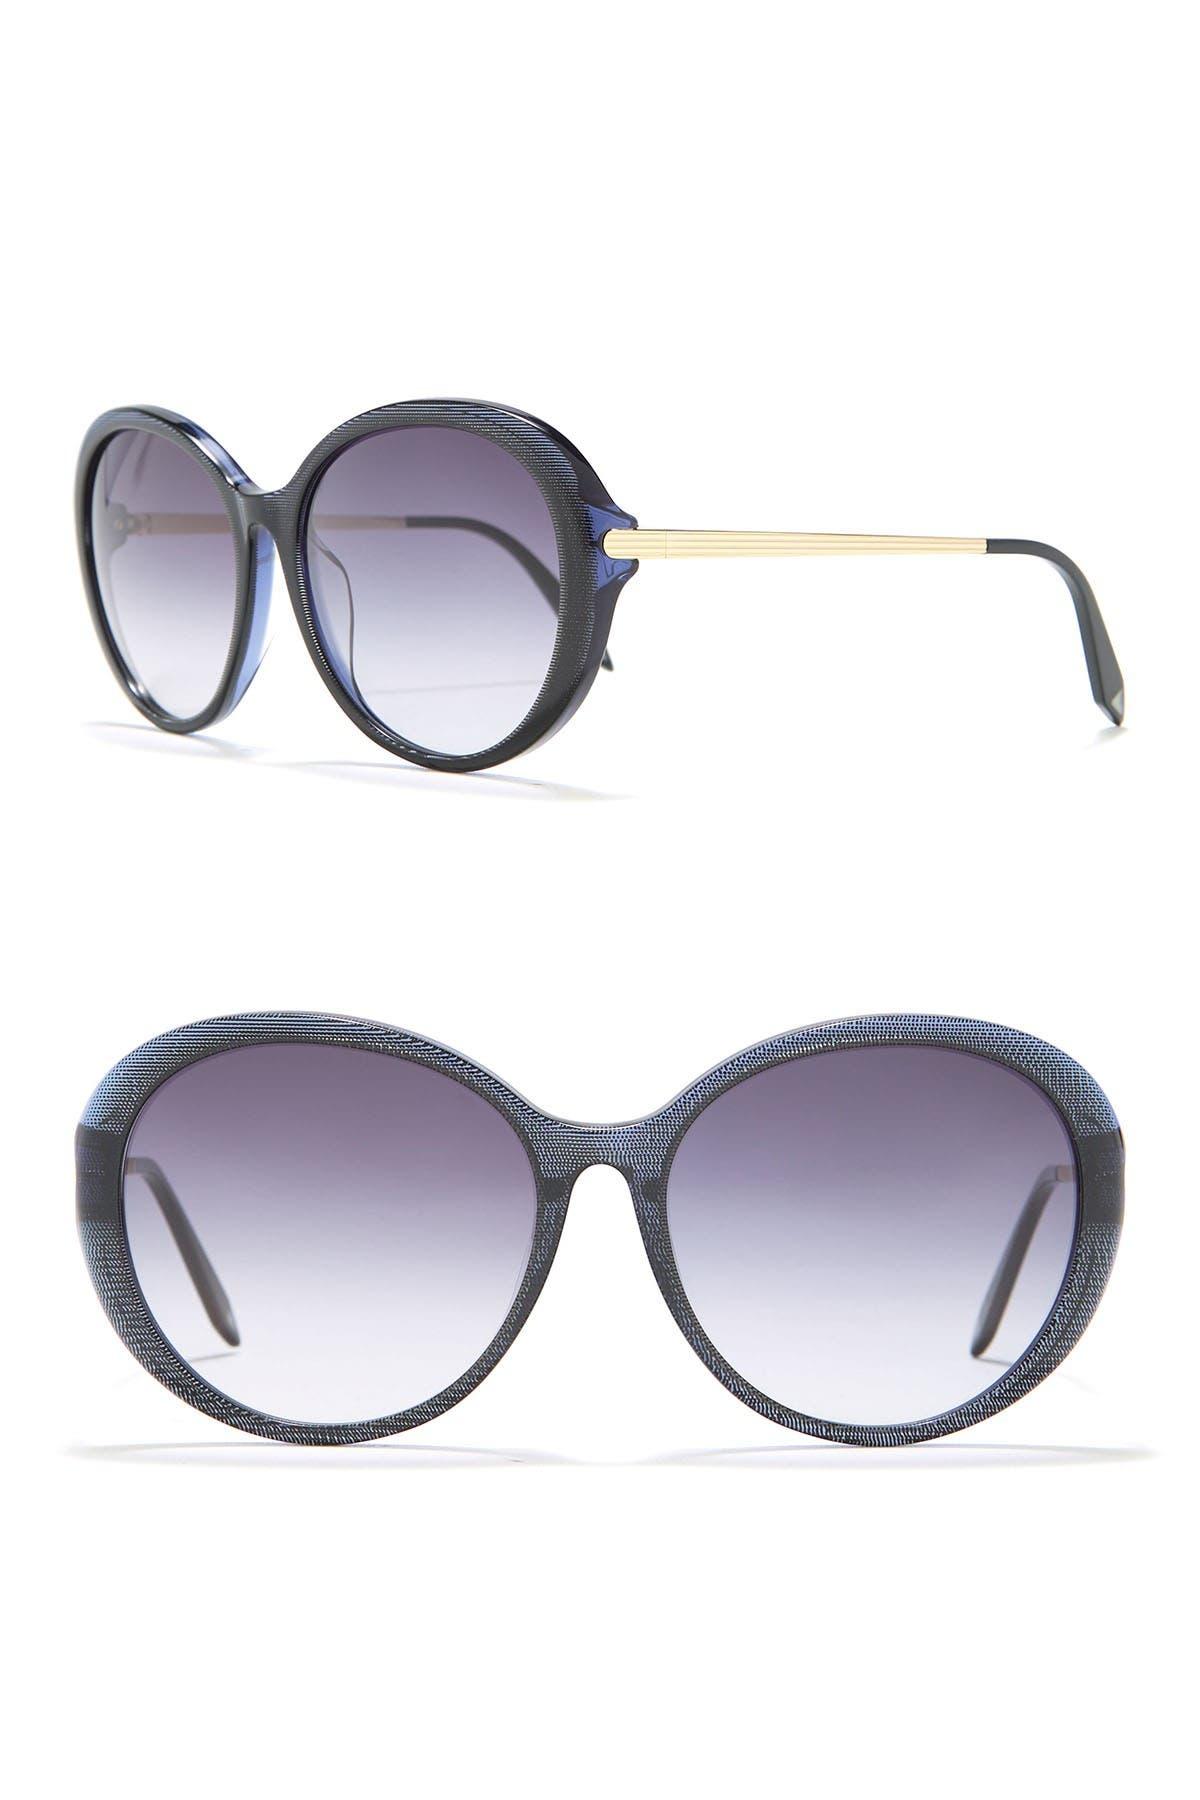 Image of Victoria Beckham 55mm Fine Oval Acetate Sunglasses